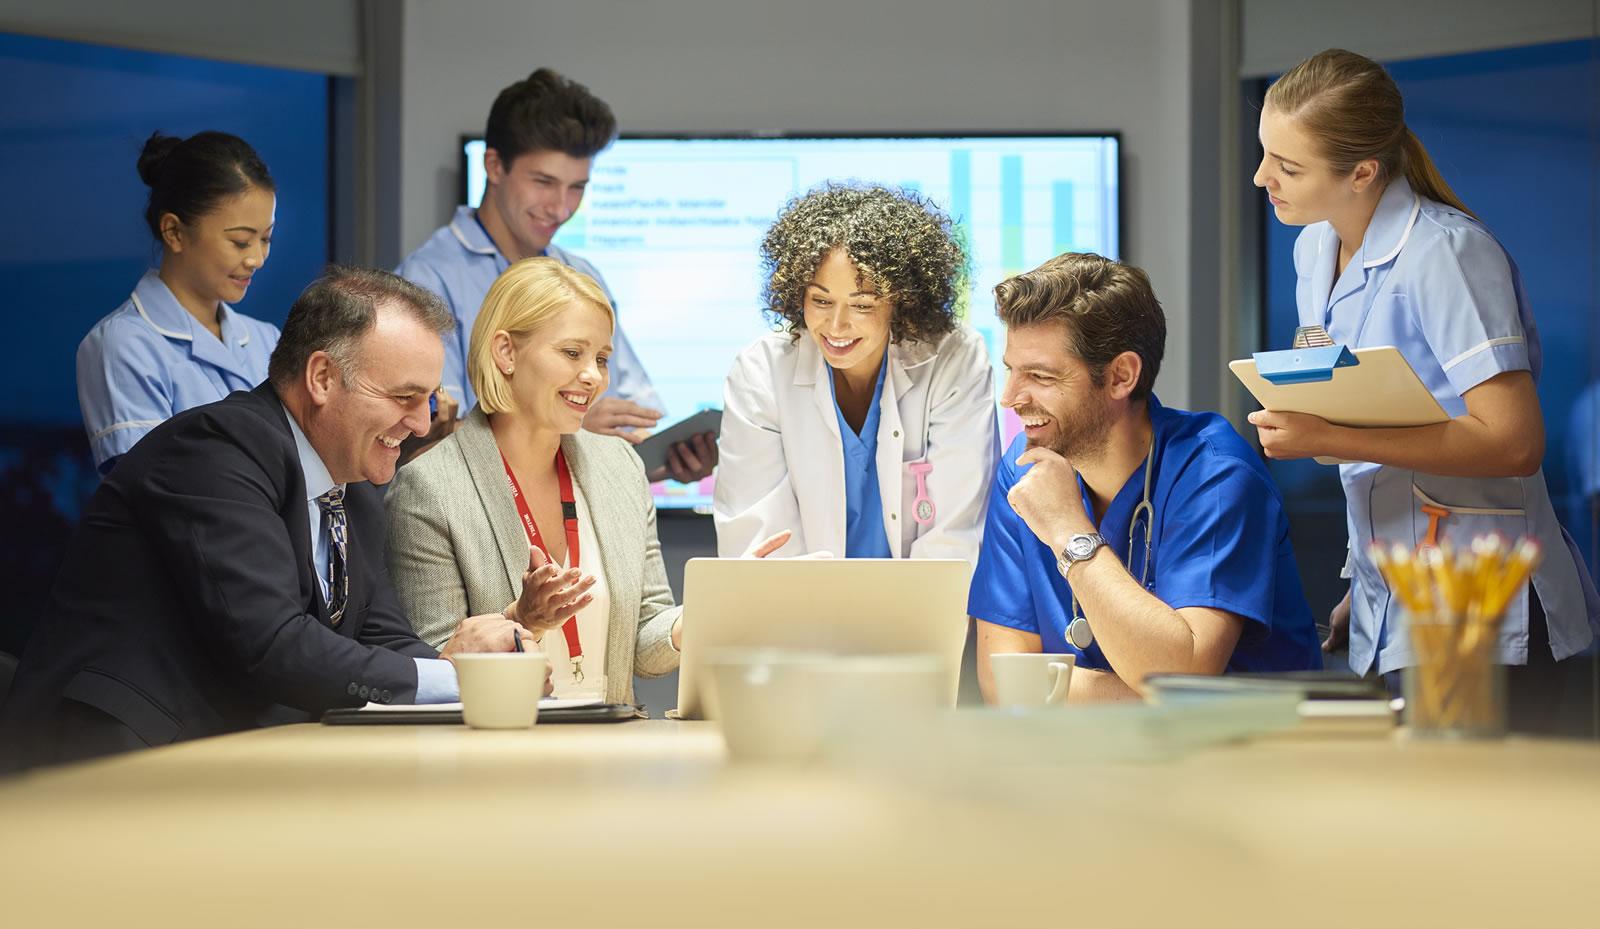 iGuana Careers - Sales Account Manager - DMS Solutions (Czech Republic) - Healthcare - Jobs & Vacancies